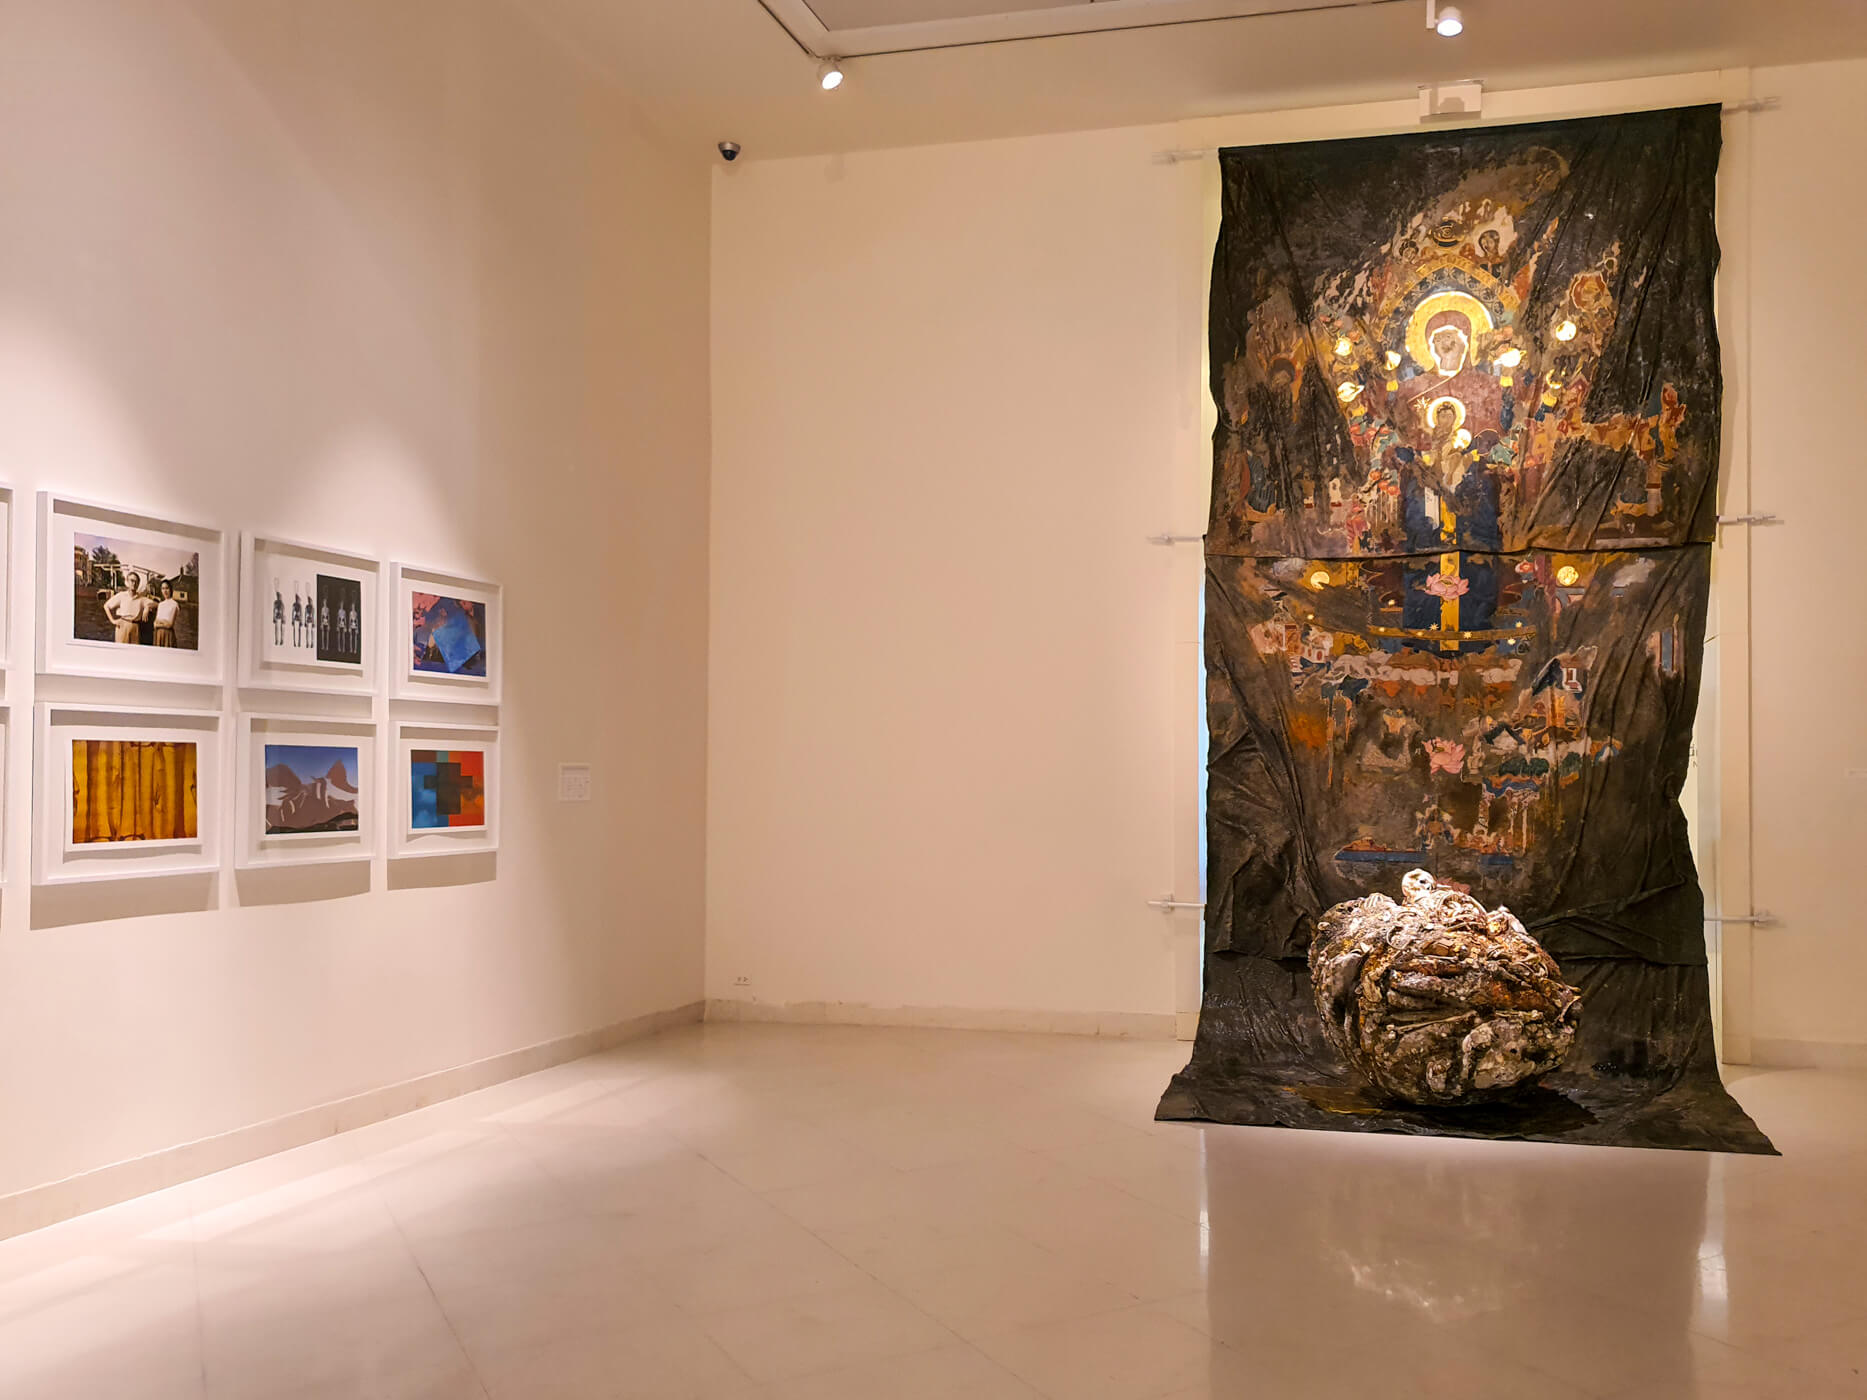 Thai visual artist all of time Modern Thai artist Student of Silpa Bhirasri, the father of modern art in Thailand